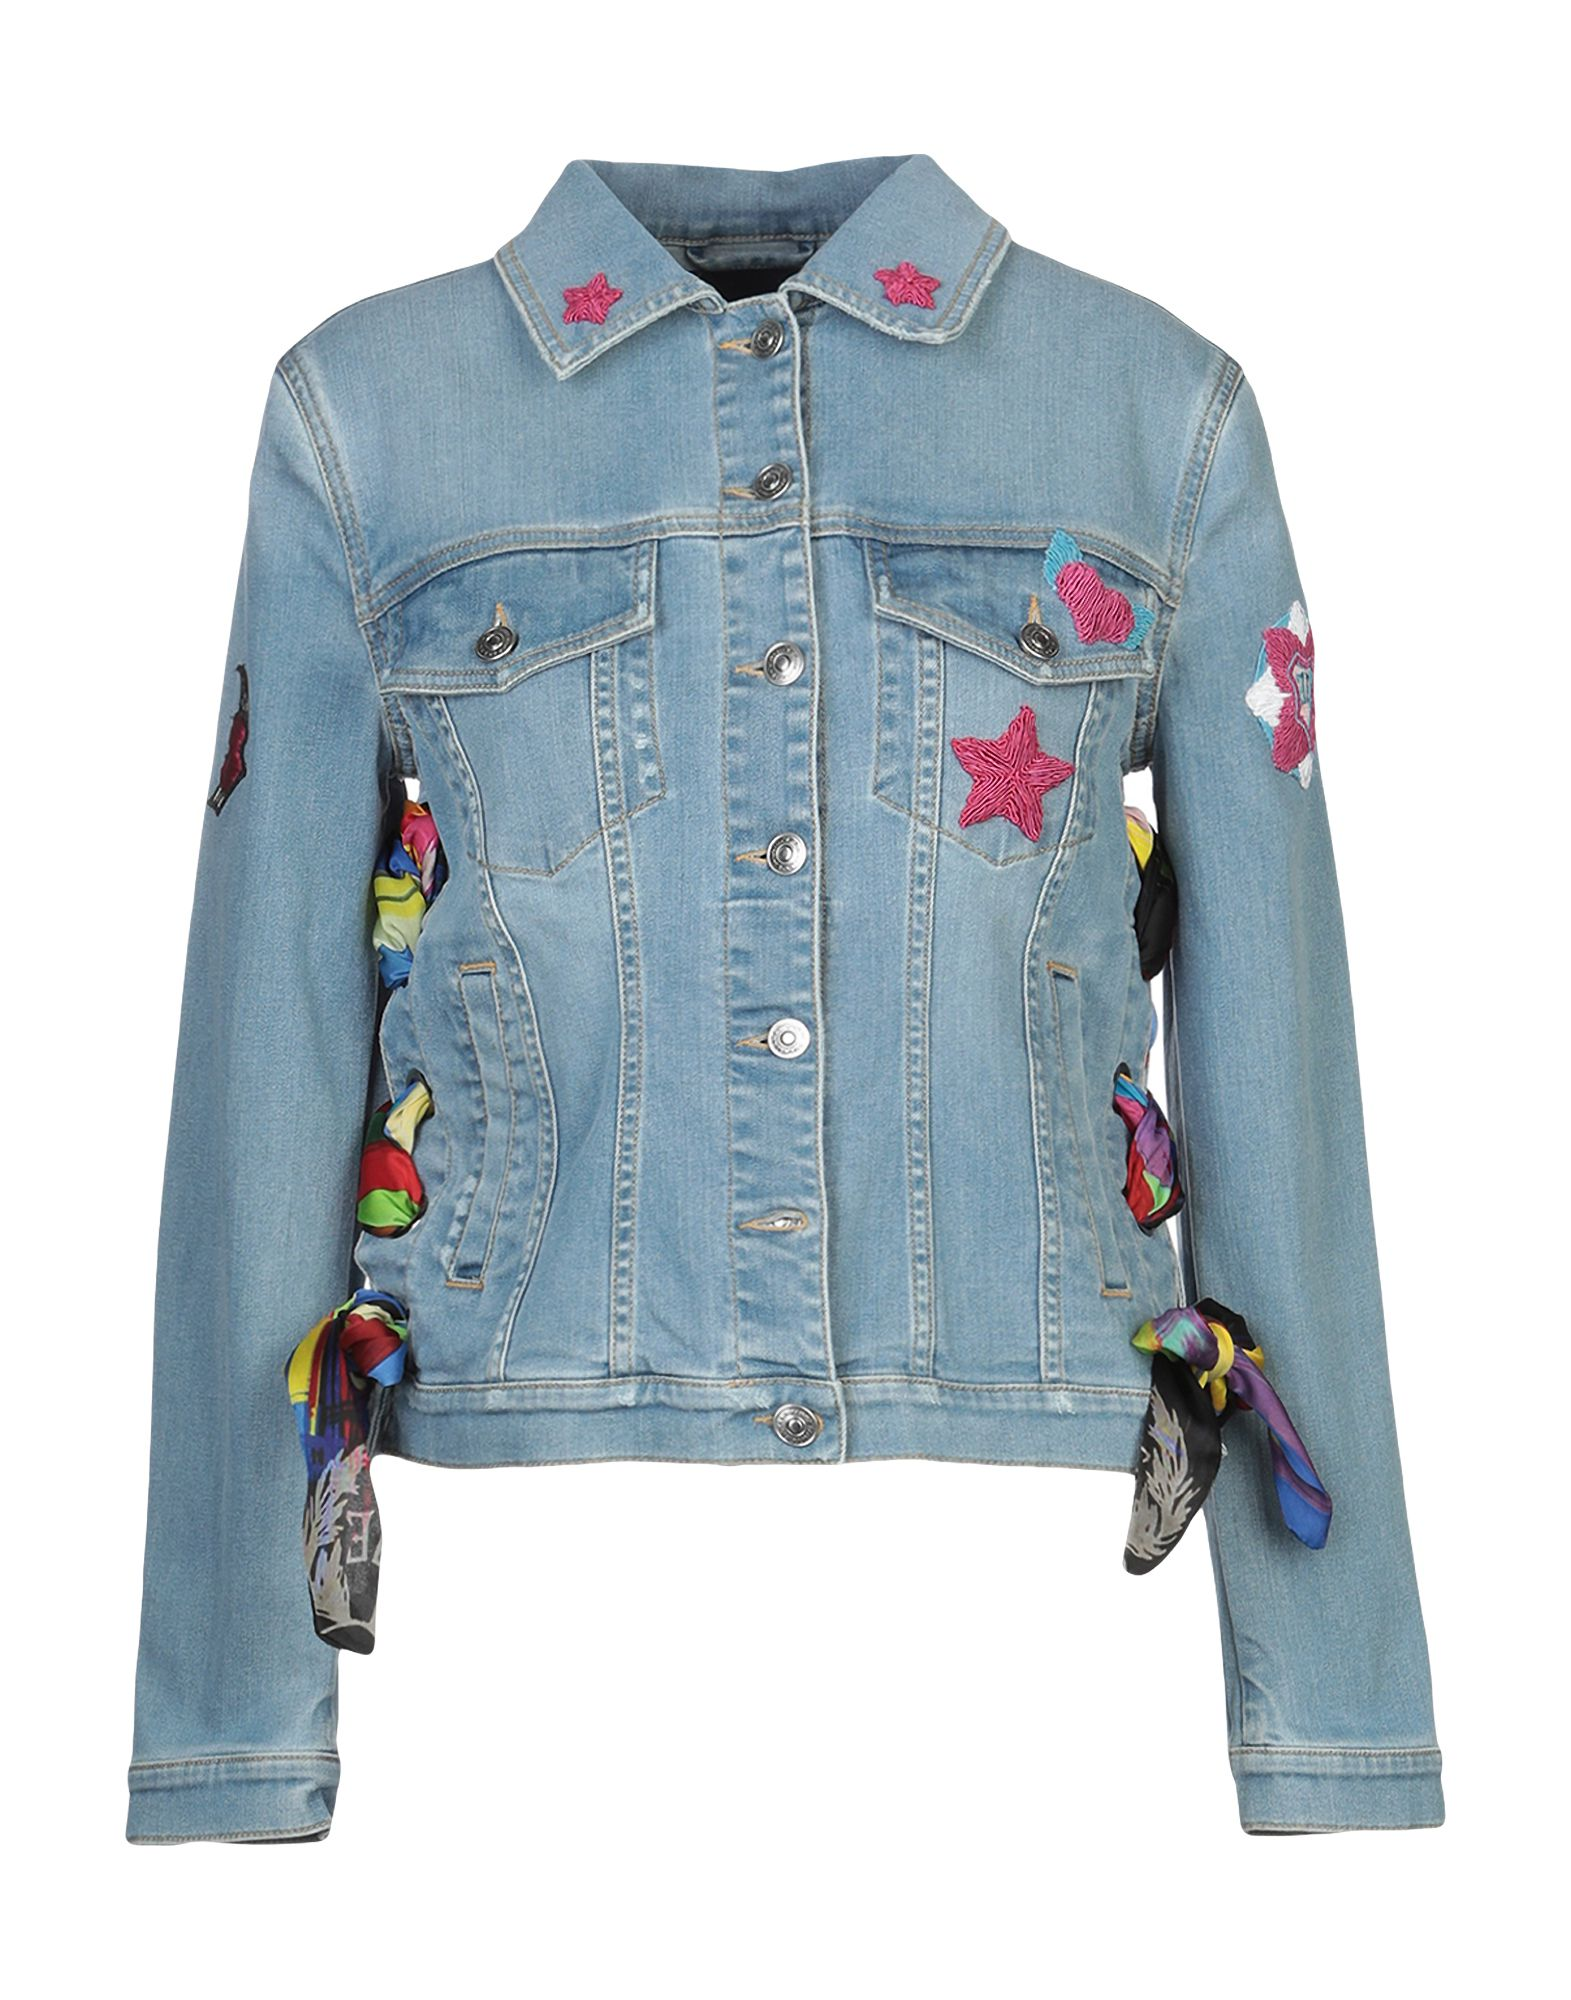 глория джинс куртка для мальчика зимняя